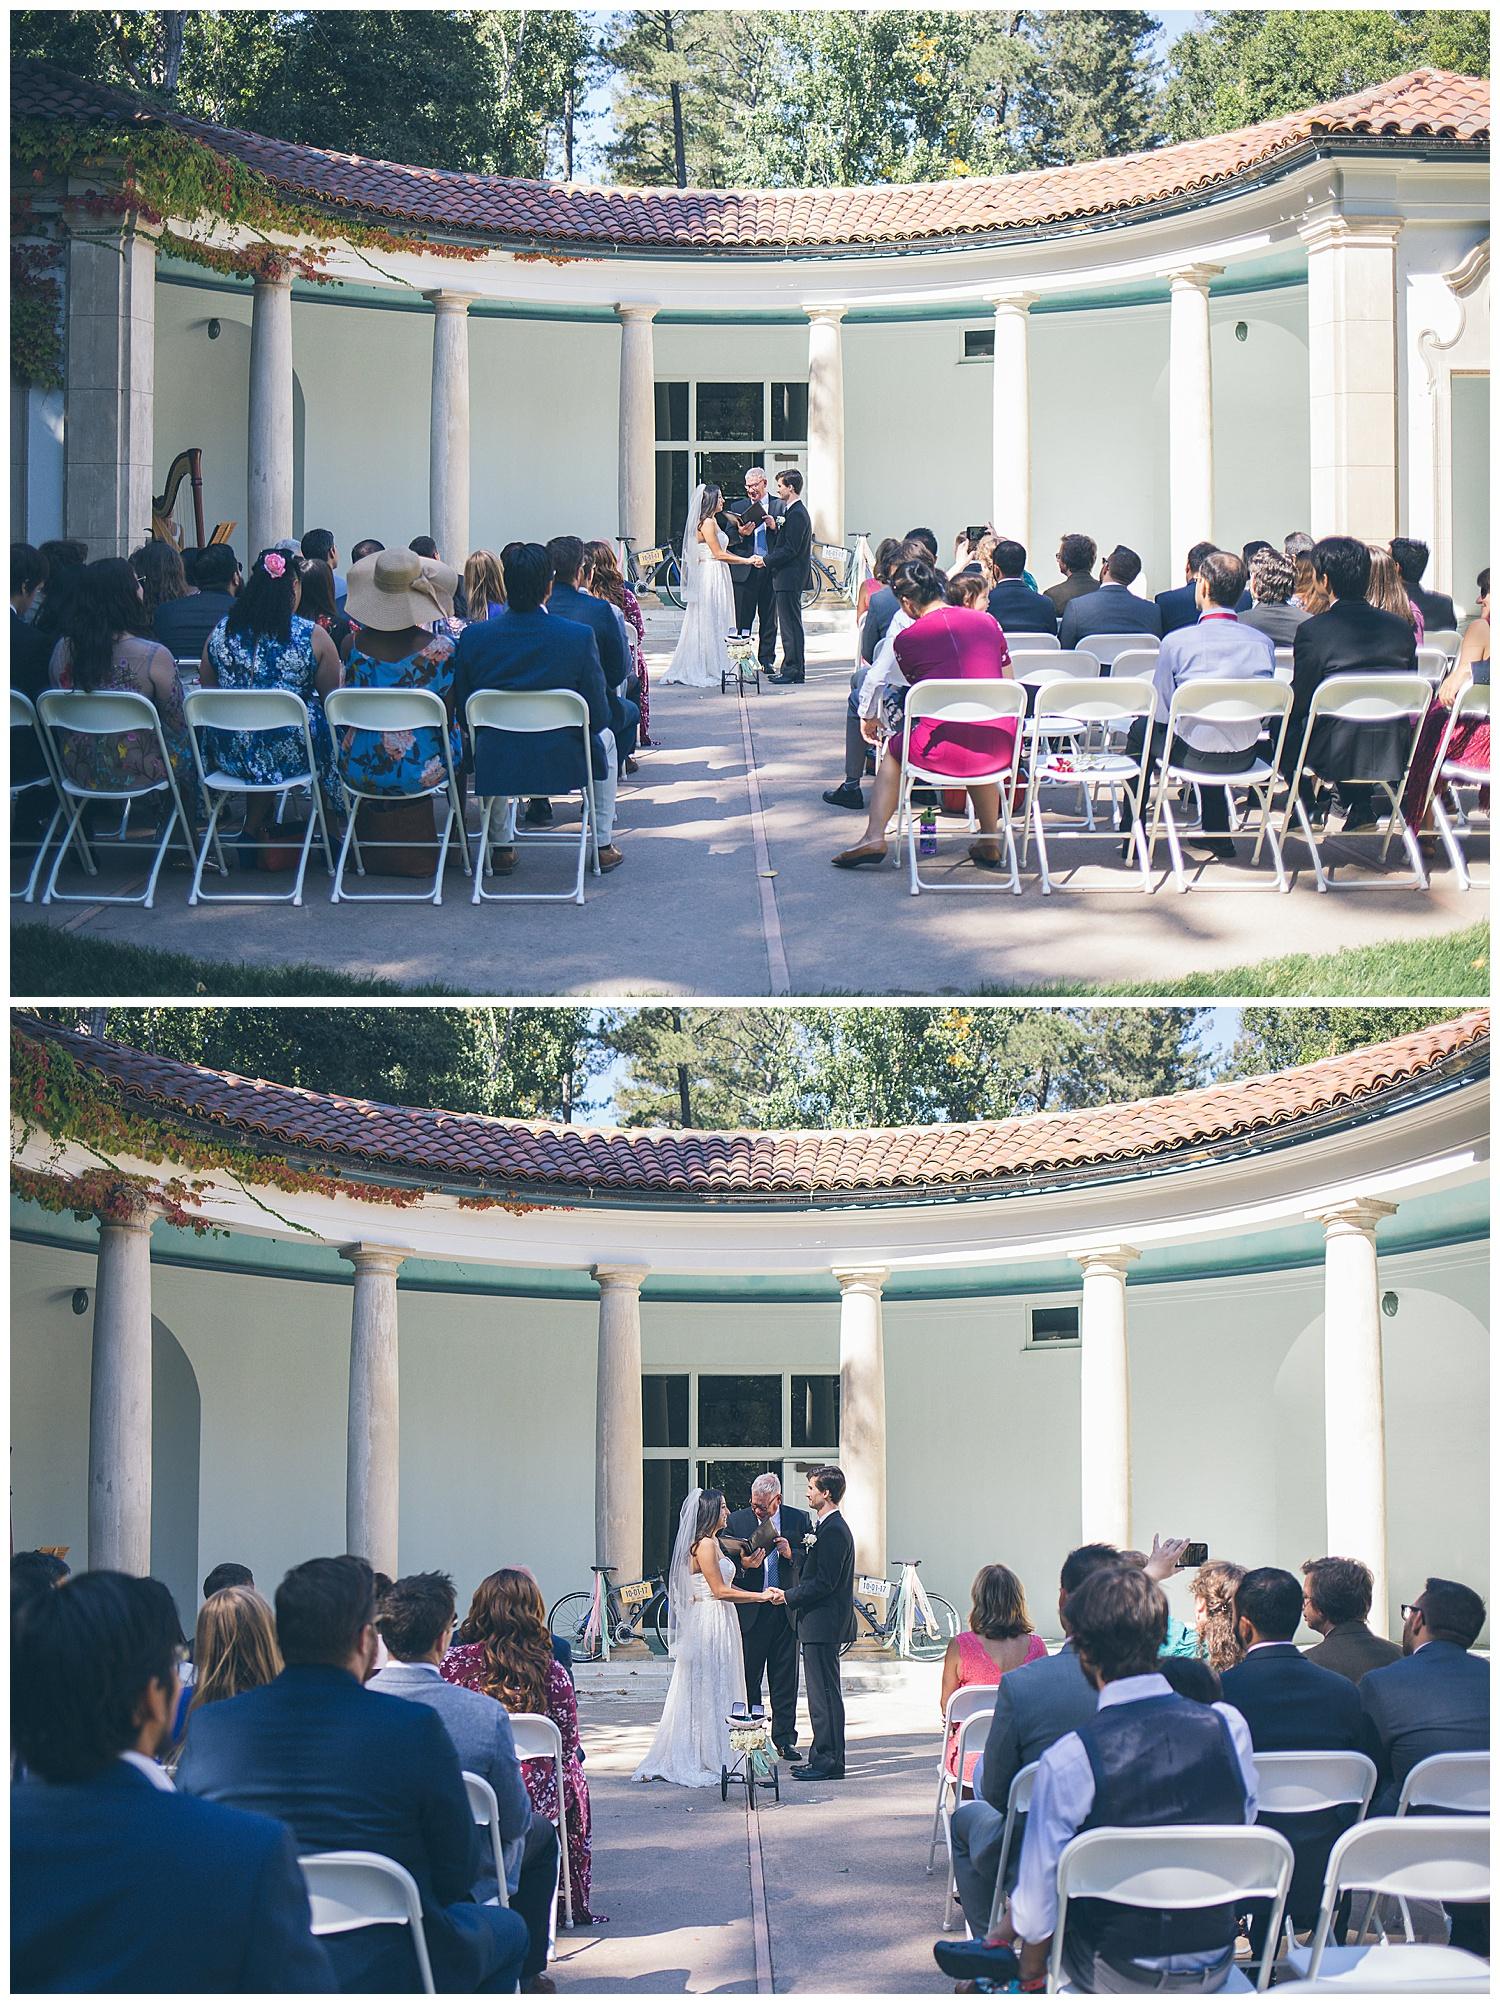 khariza-rae-photography-bay-area-wedding-photographer_0139.jpg